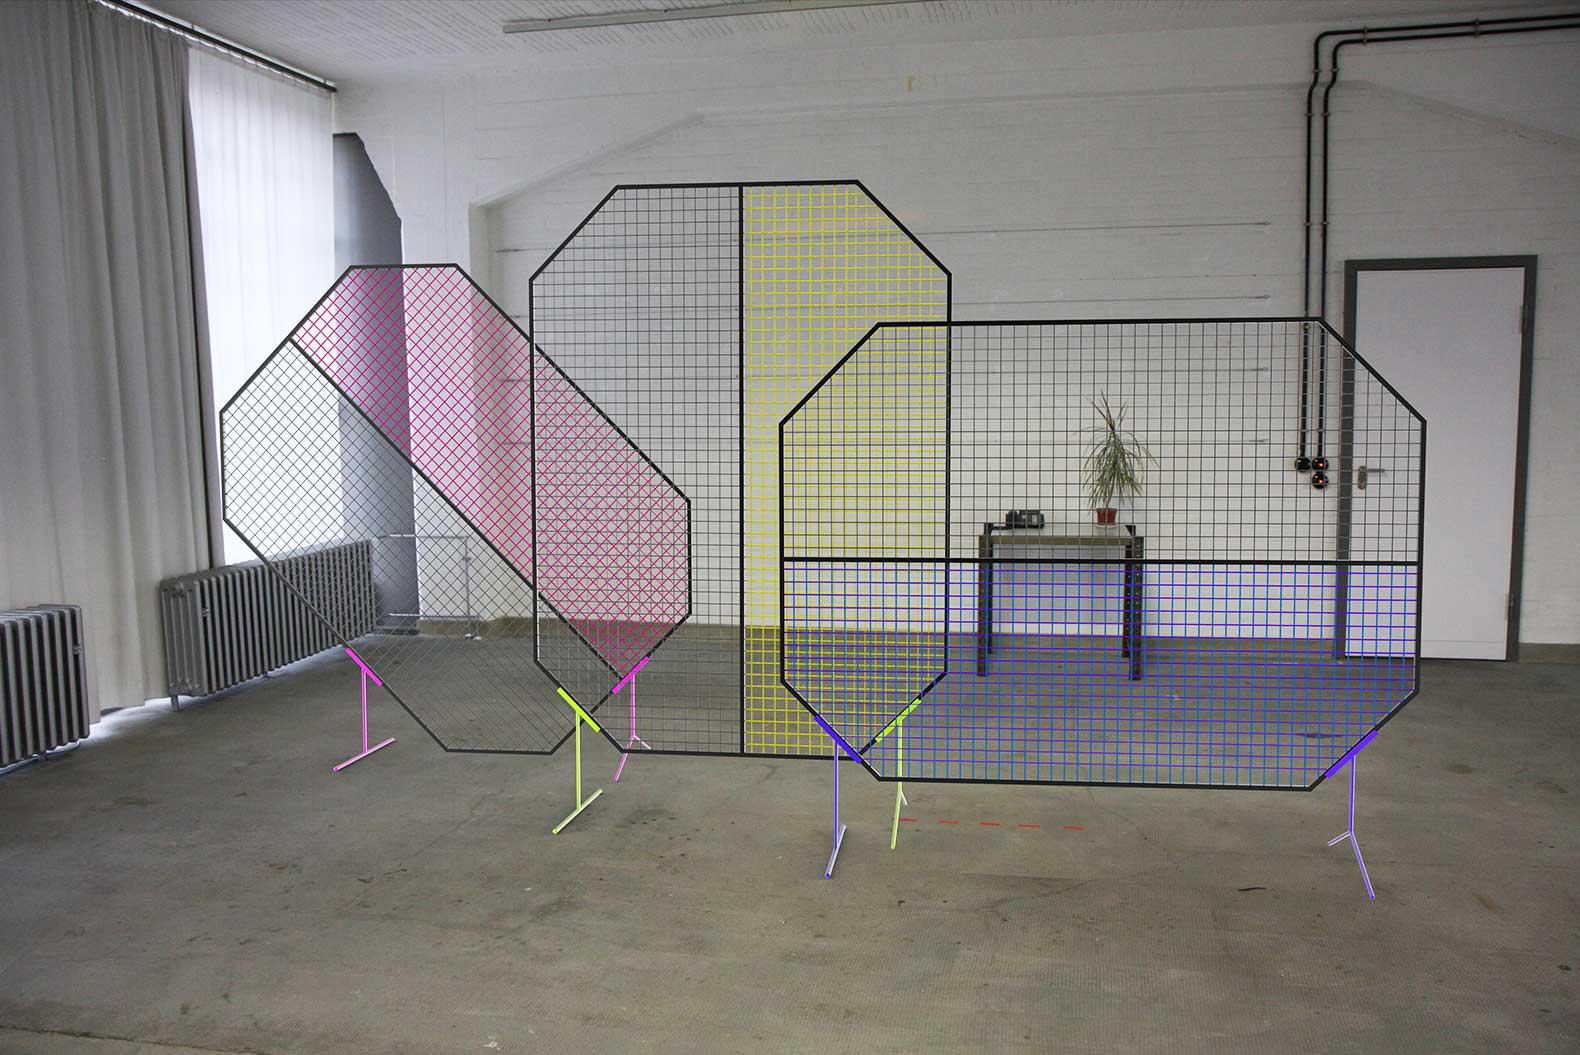 Studio Balagan, Matchpoint, Bauhaus Dessau Foundation, storage solution, hanger, tennis aesthetics, retro aesthetics, second skin,